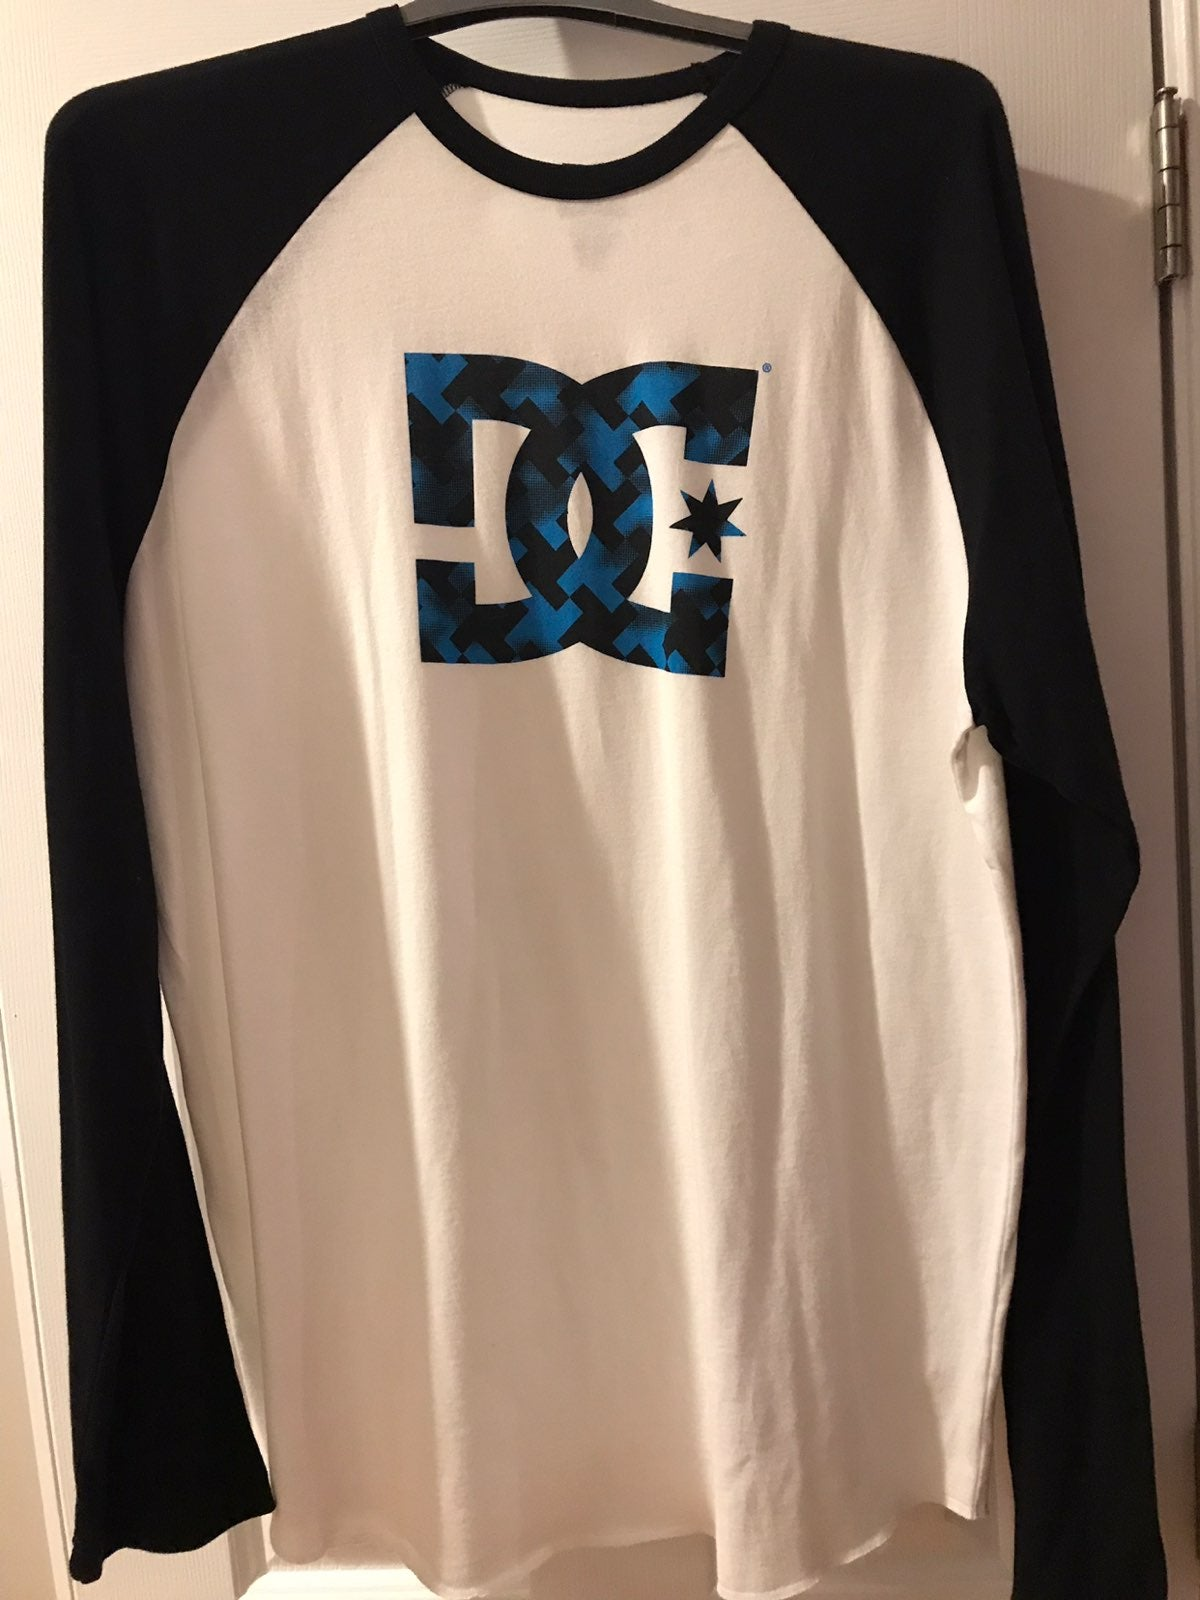 Mens Long Sleeve DC Tee Shirt XL New